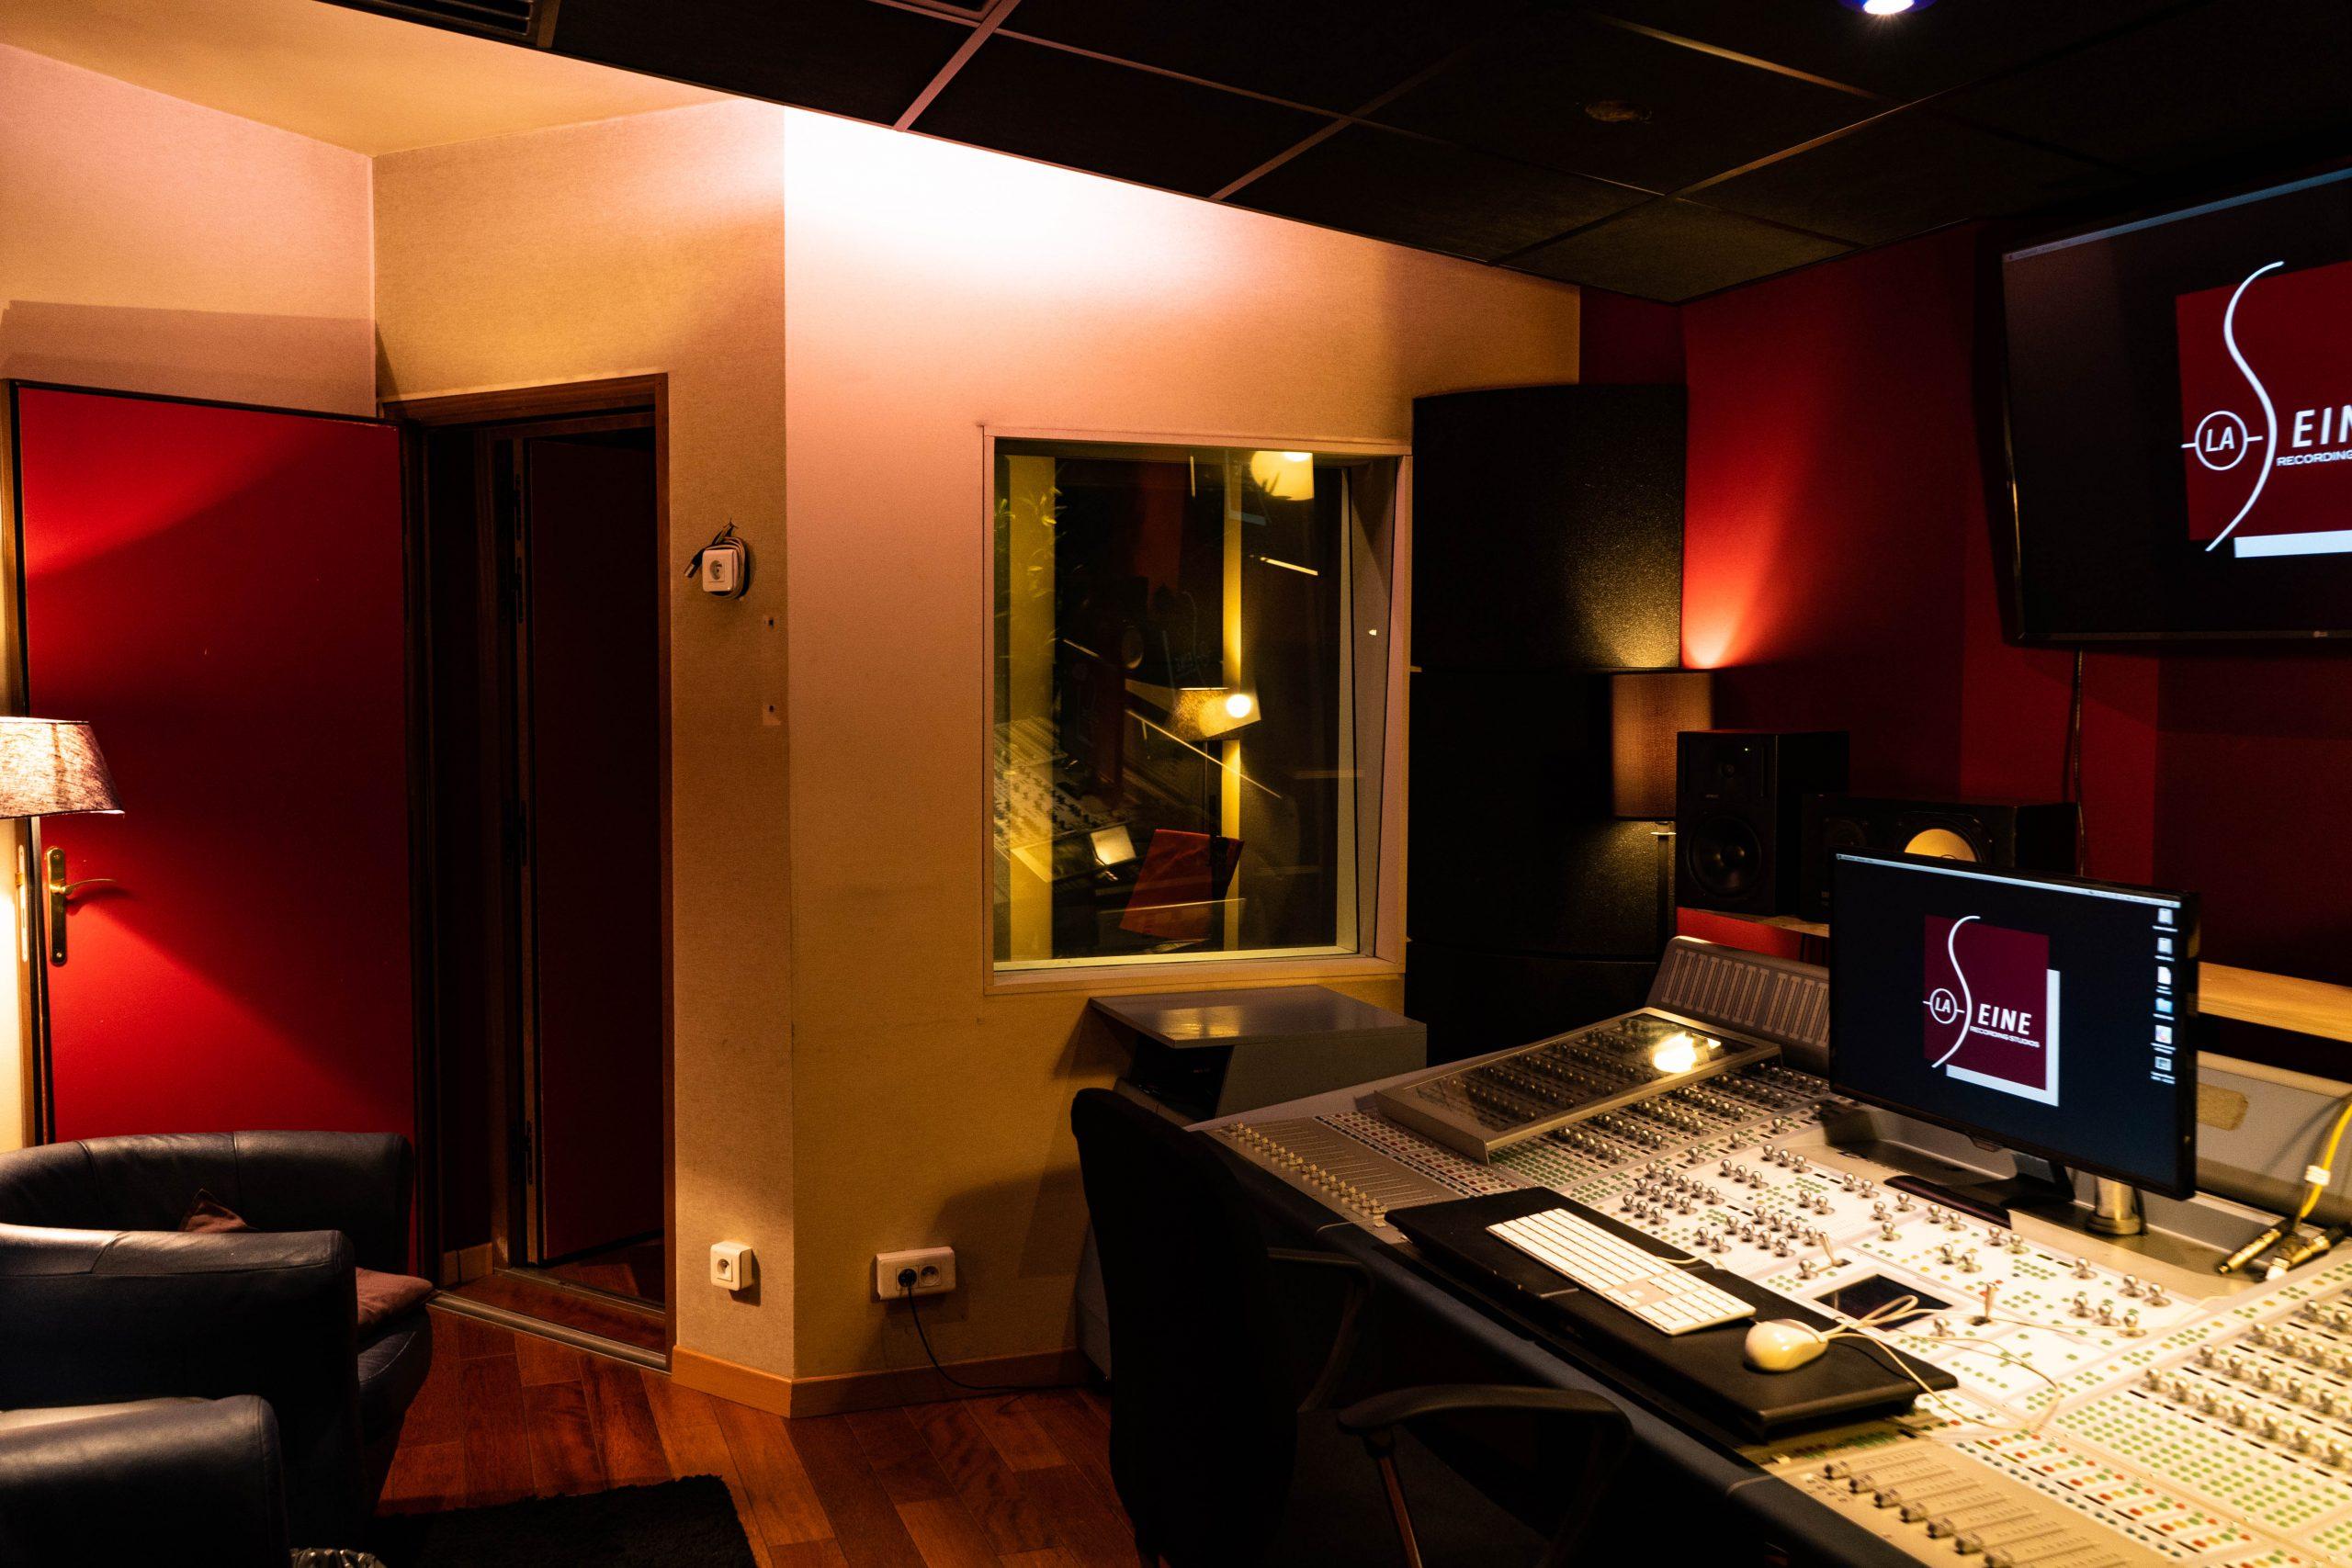 STUDIO H - CONTROL ROOM